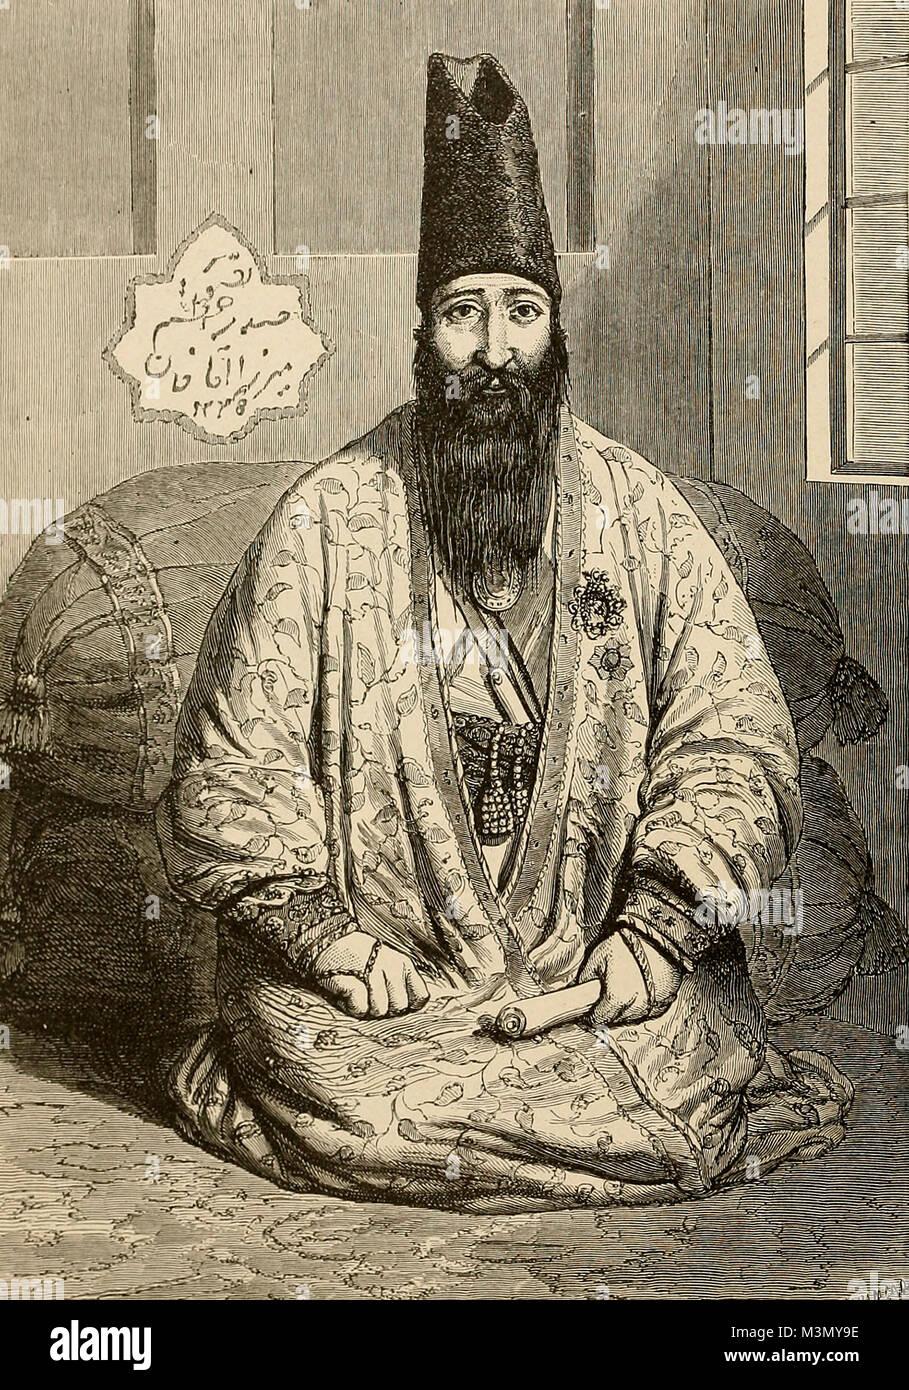 Persian Scholar Type - Haji Mirza Ughazzi - Stock Image